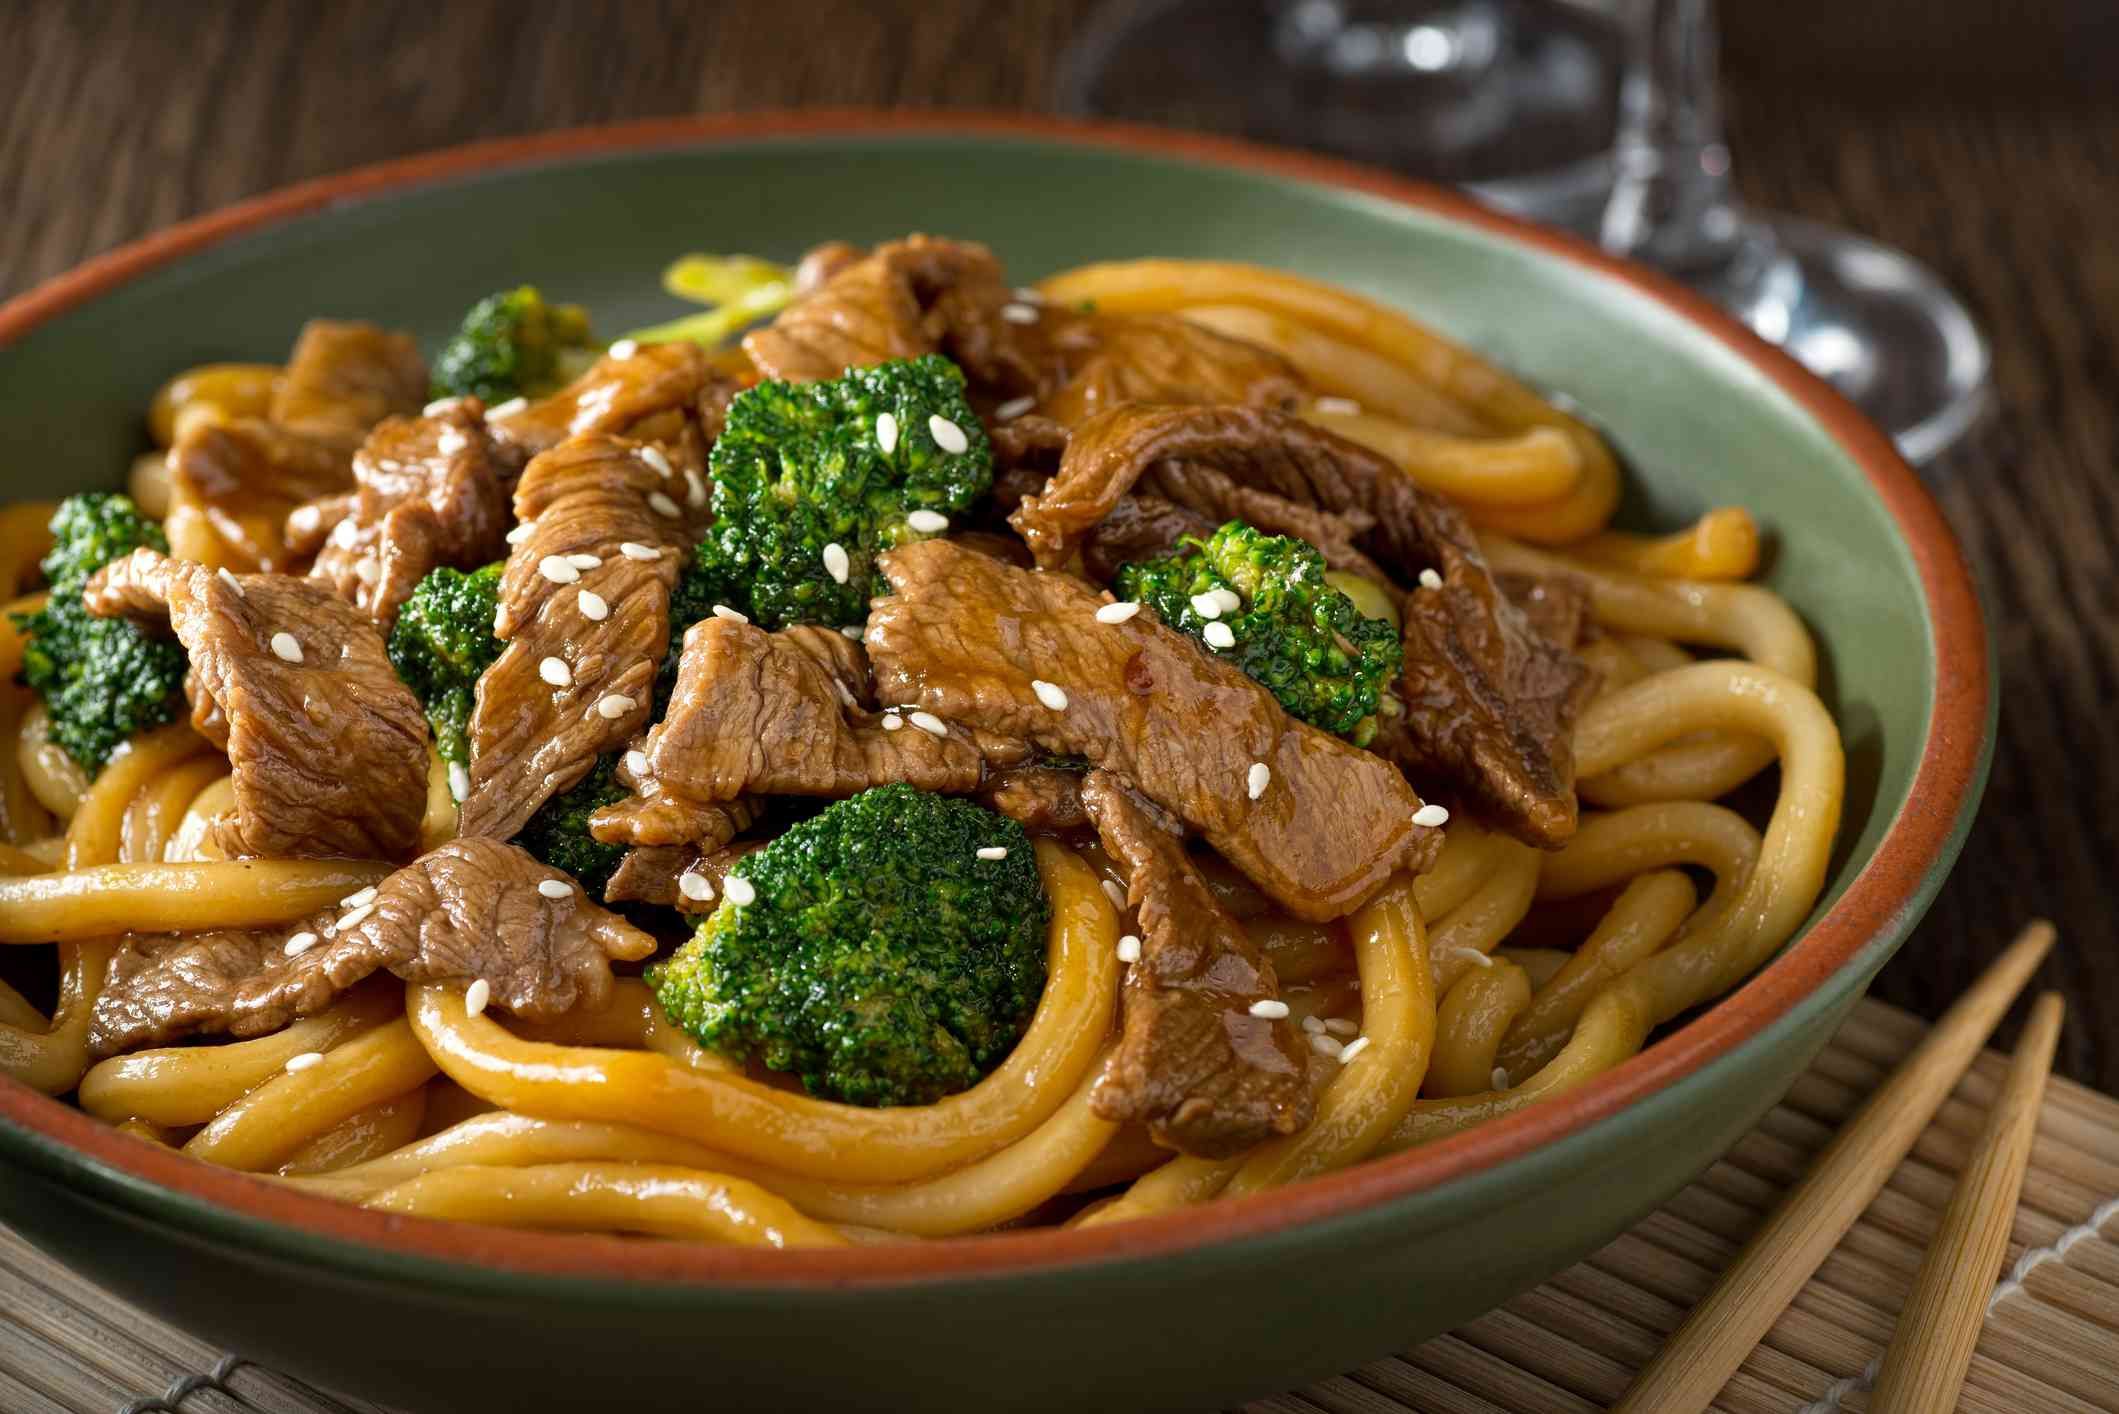 Beef Teriyaki with Udon Noodles